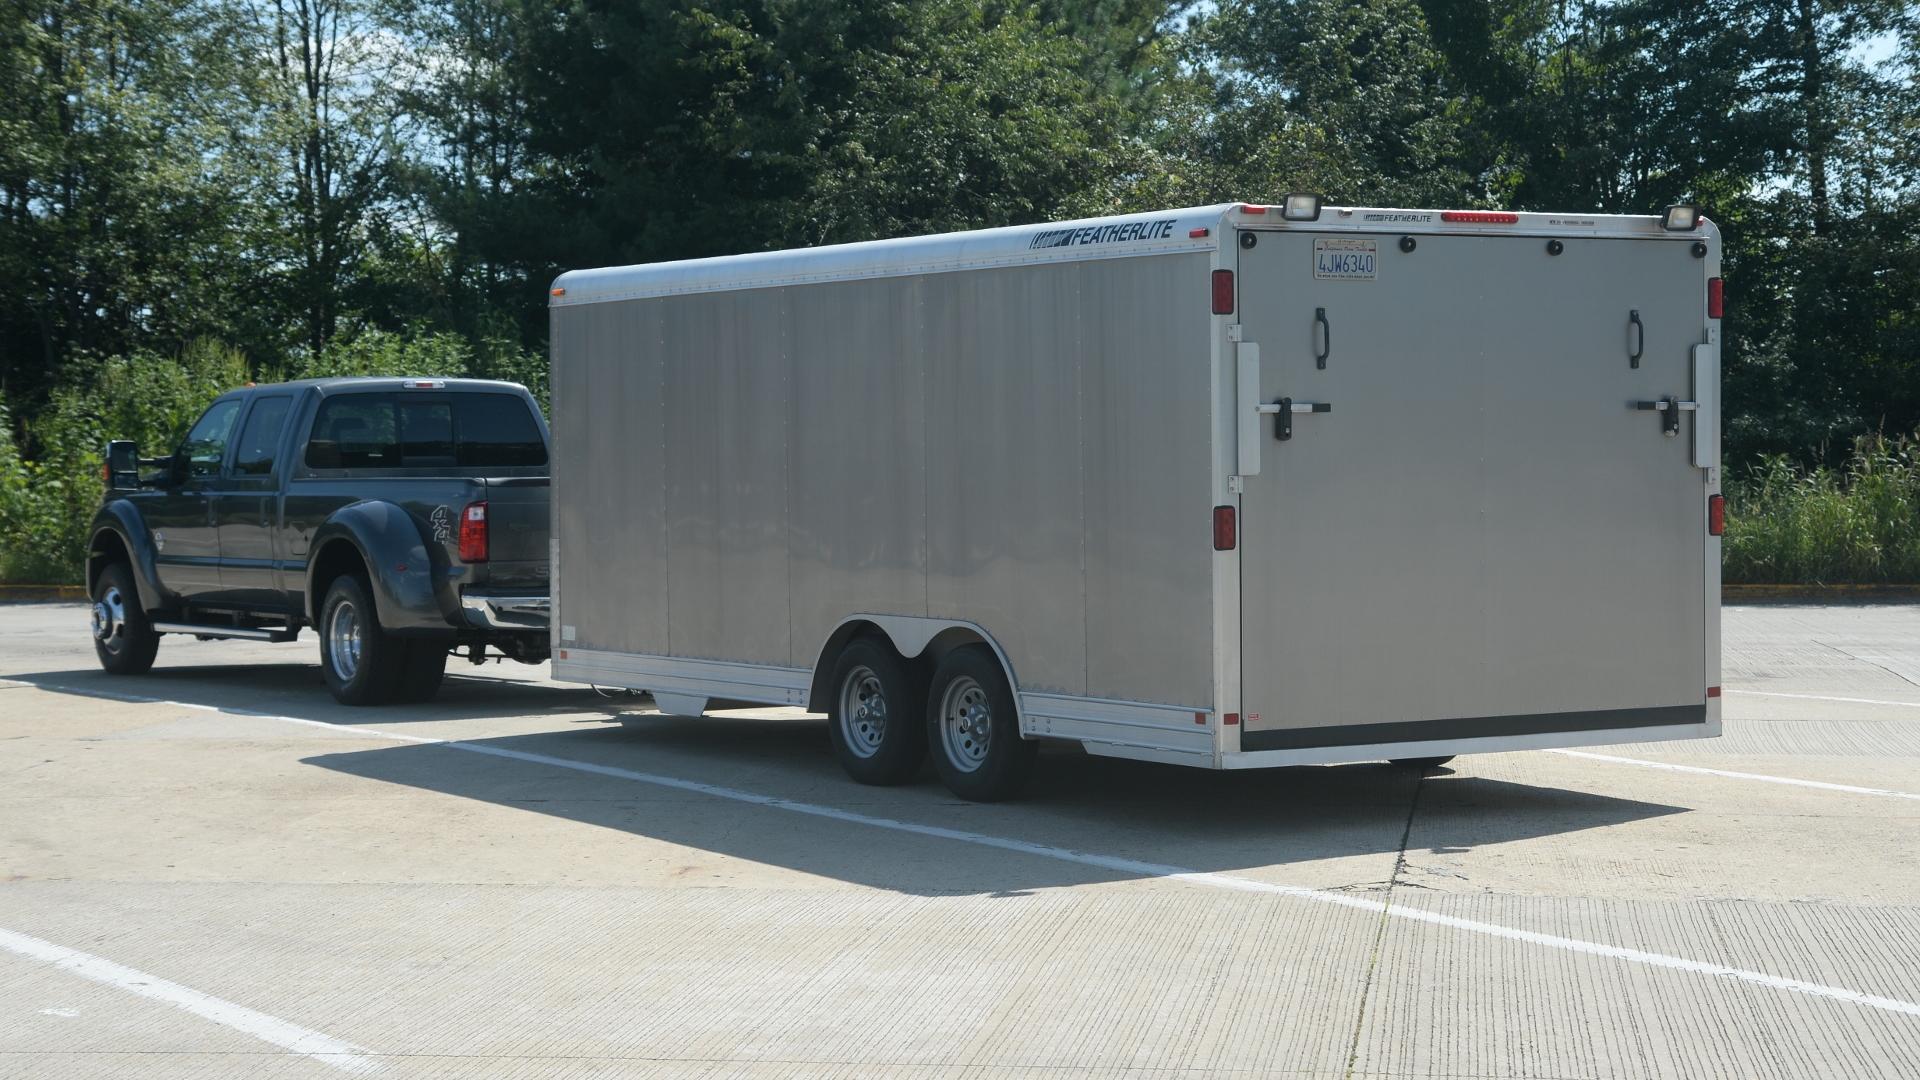 Lotus Eleven race car trailer